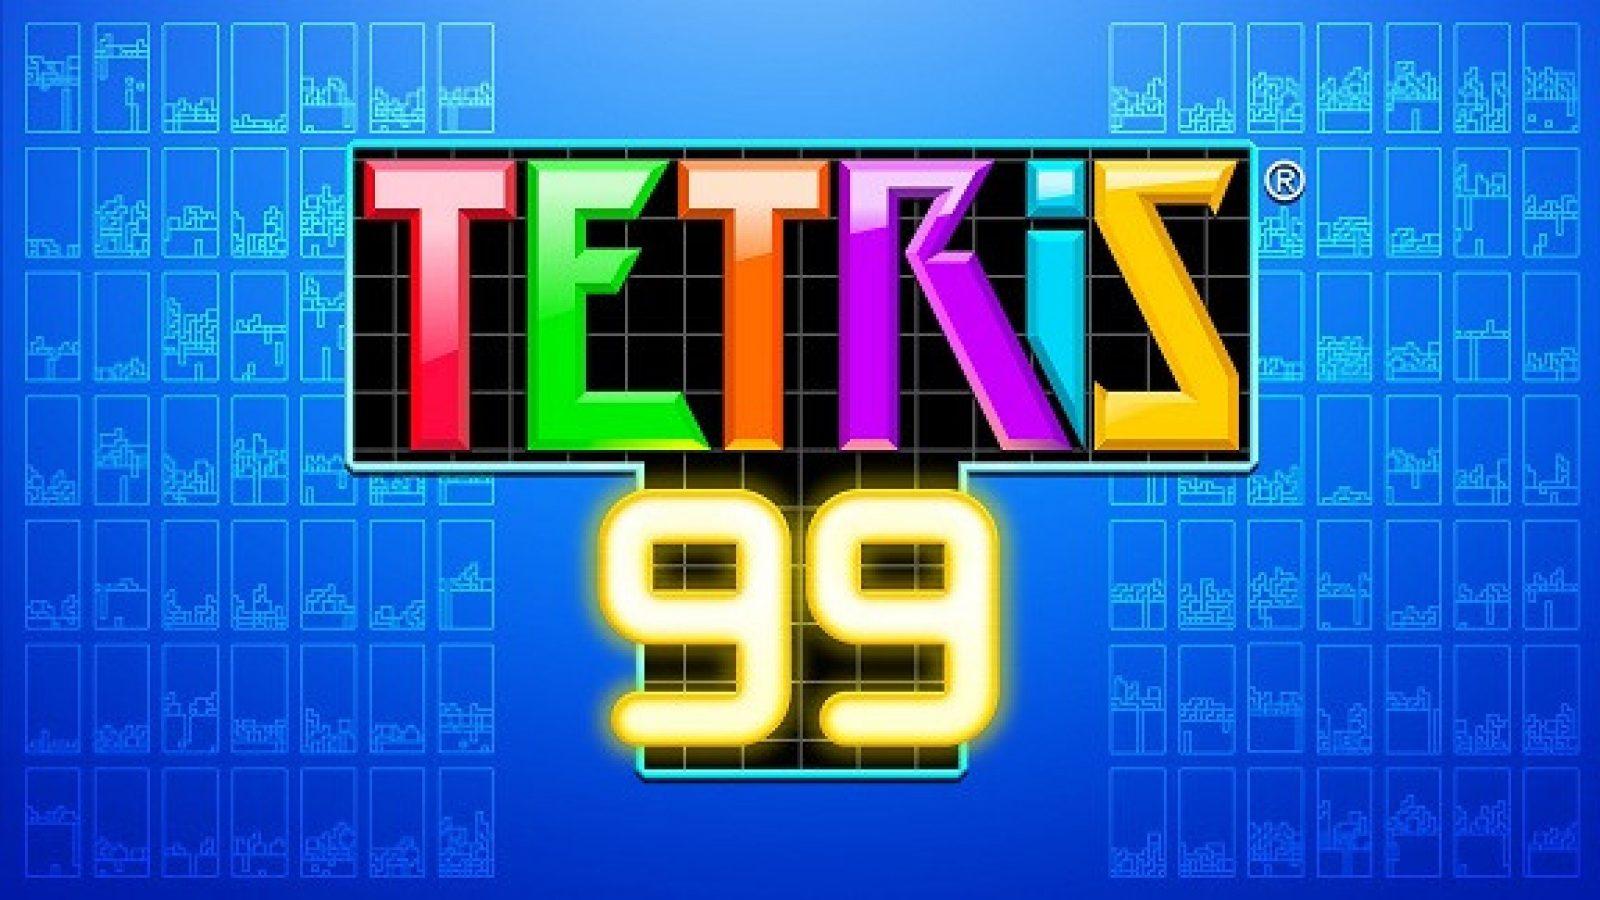 Tetris 99   Nintendos new battle royale game Dexertocom 1600x900